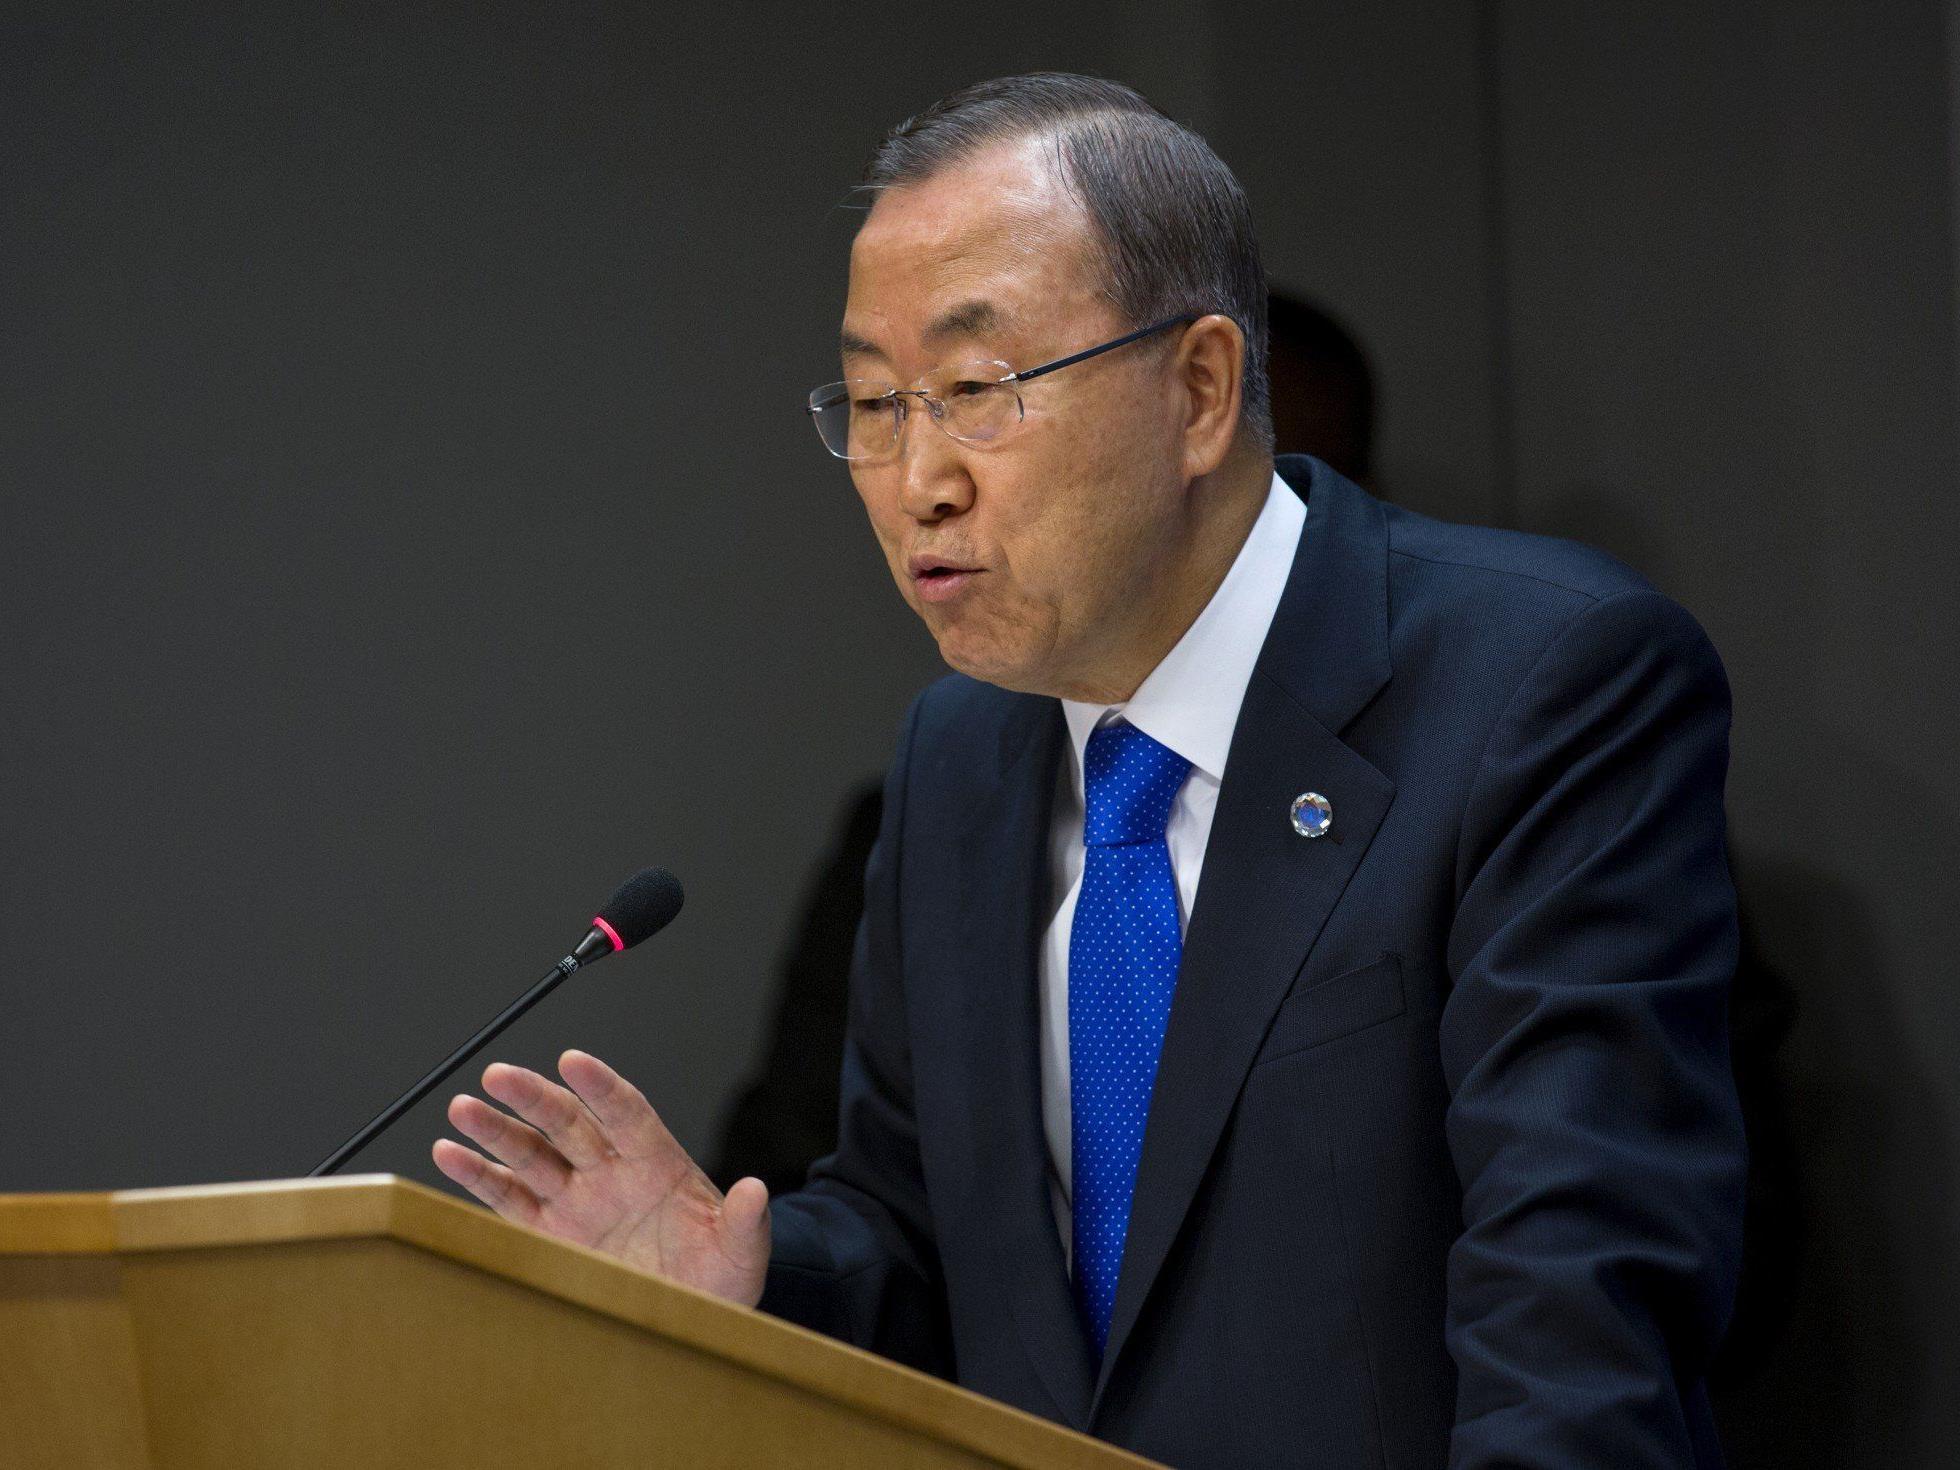 Generalsekretär Ban Ki-moon hat Bericht allerdings noch nicht erhalten